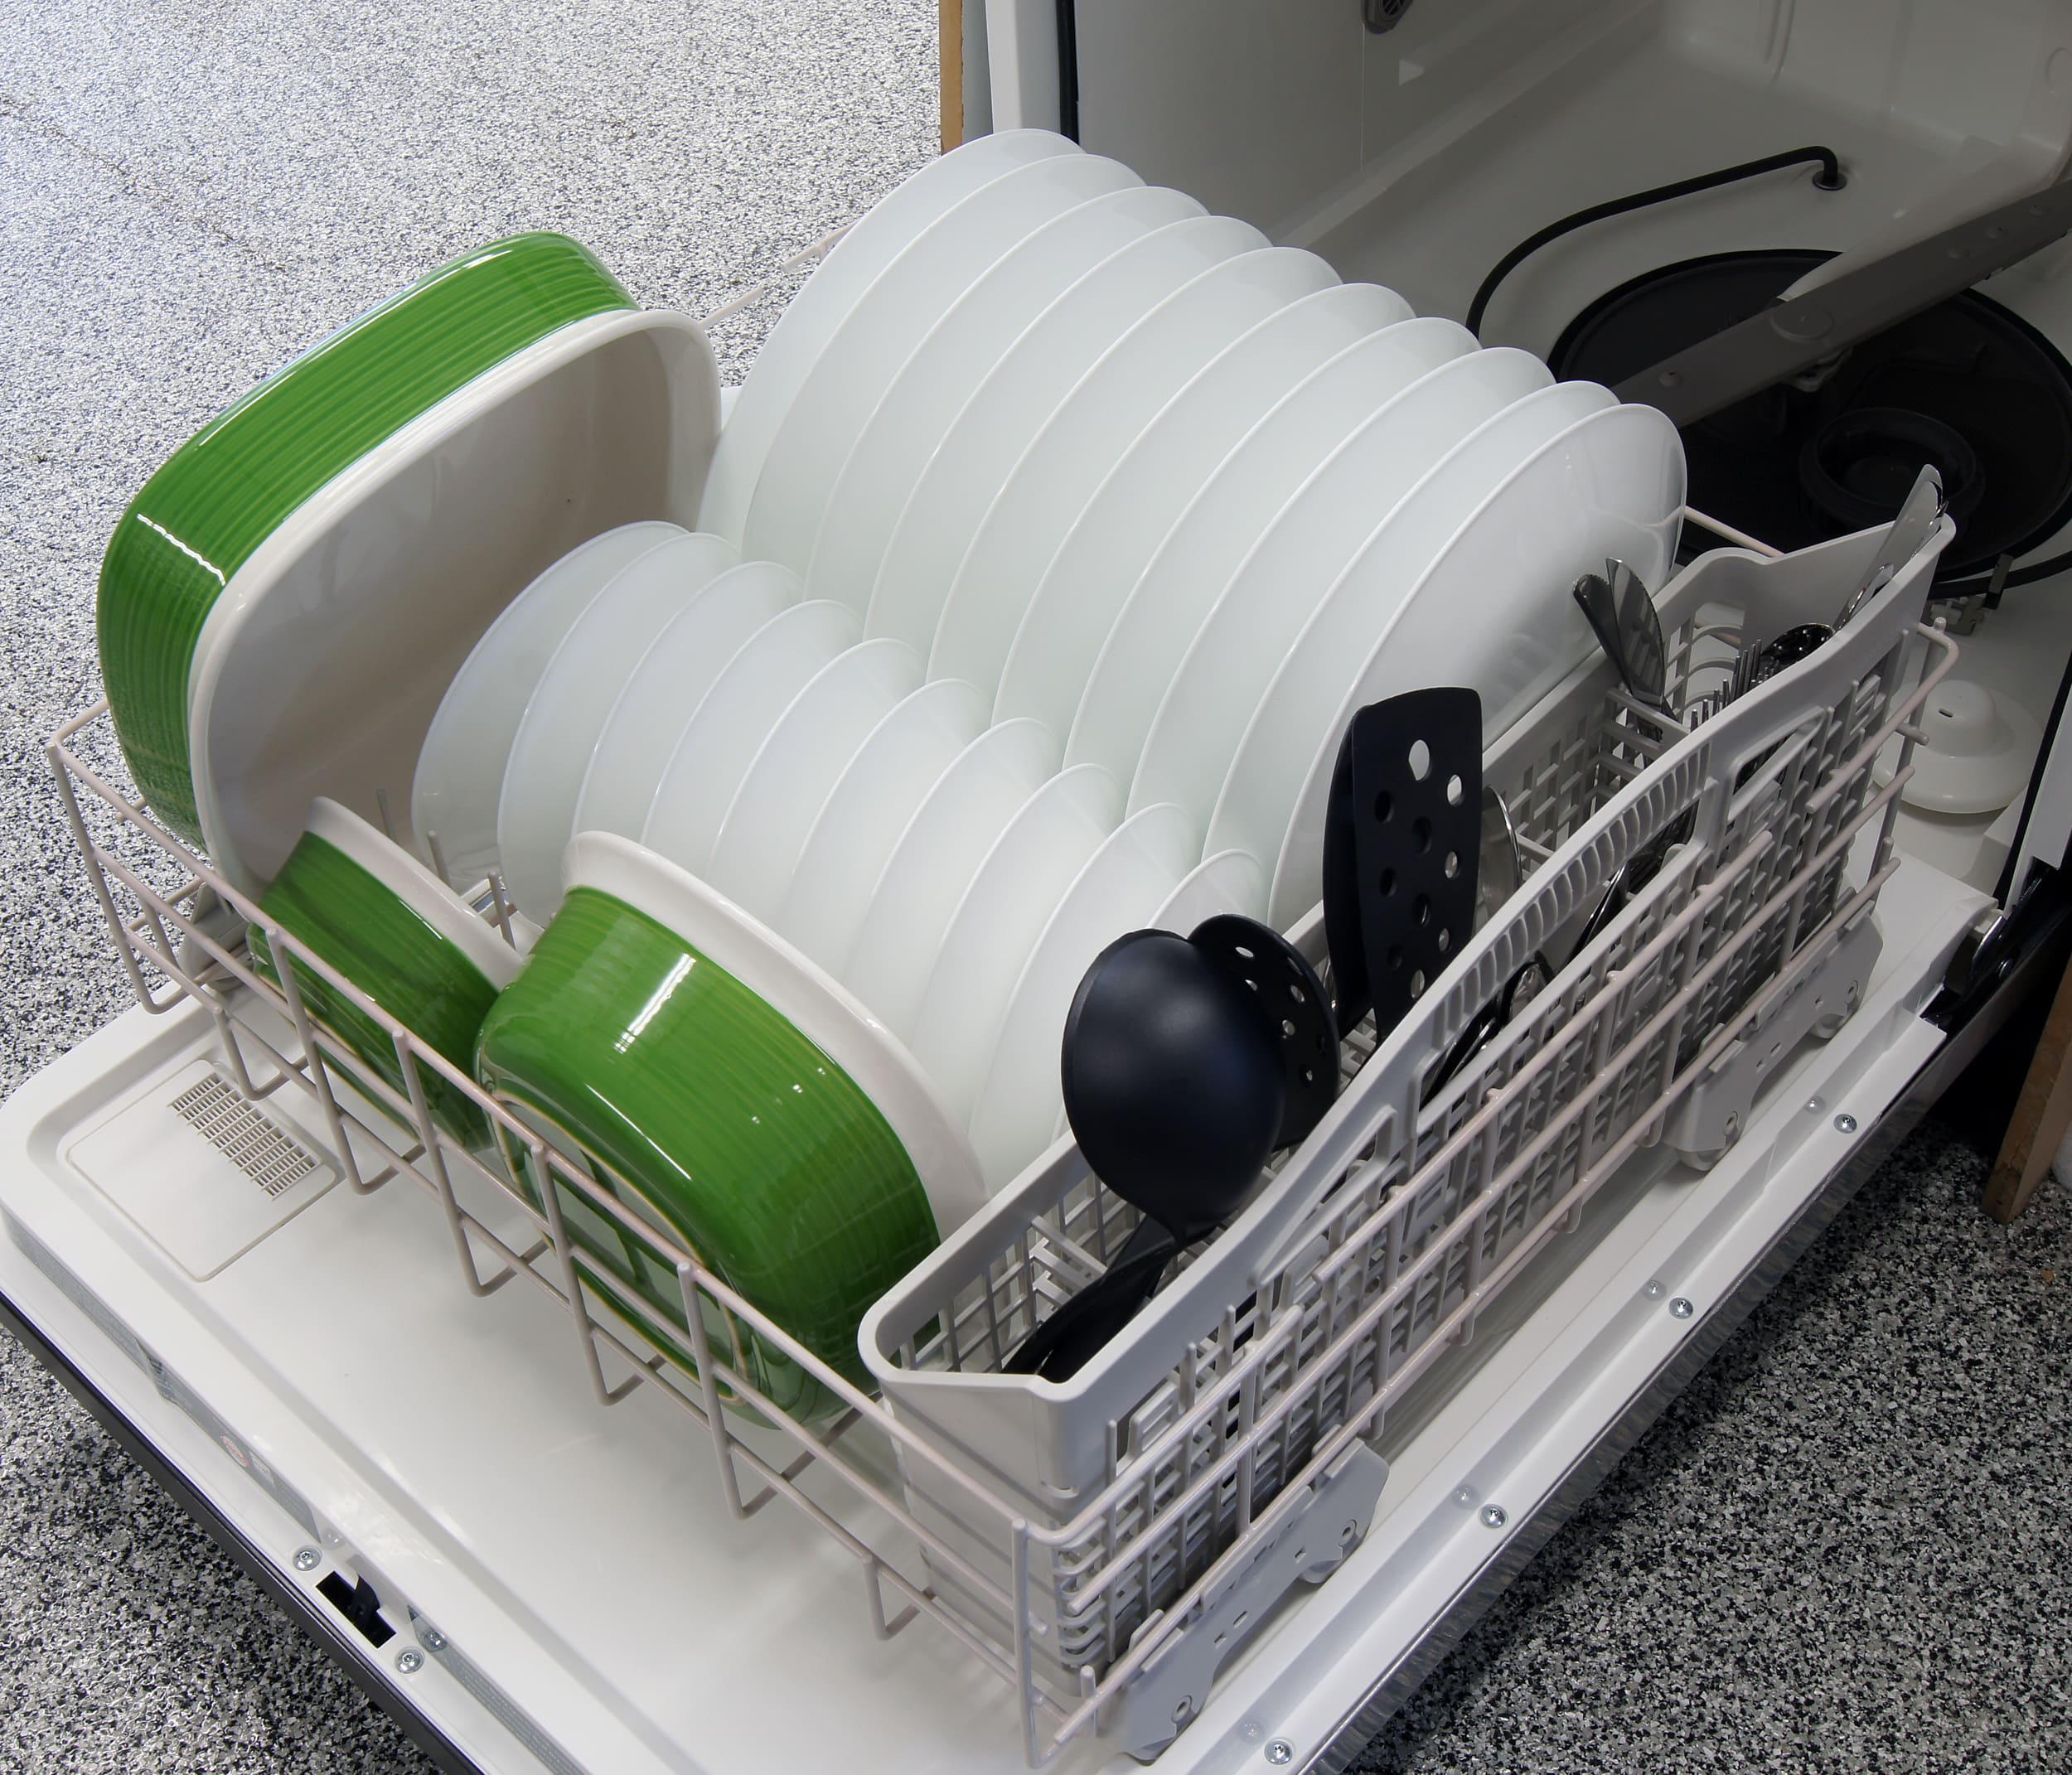 Whirlpool WDF310PAAS bottom rack capacity